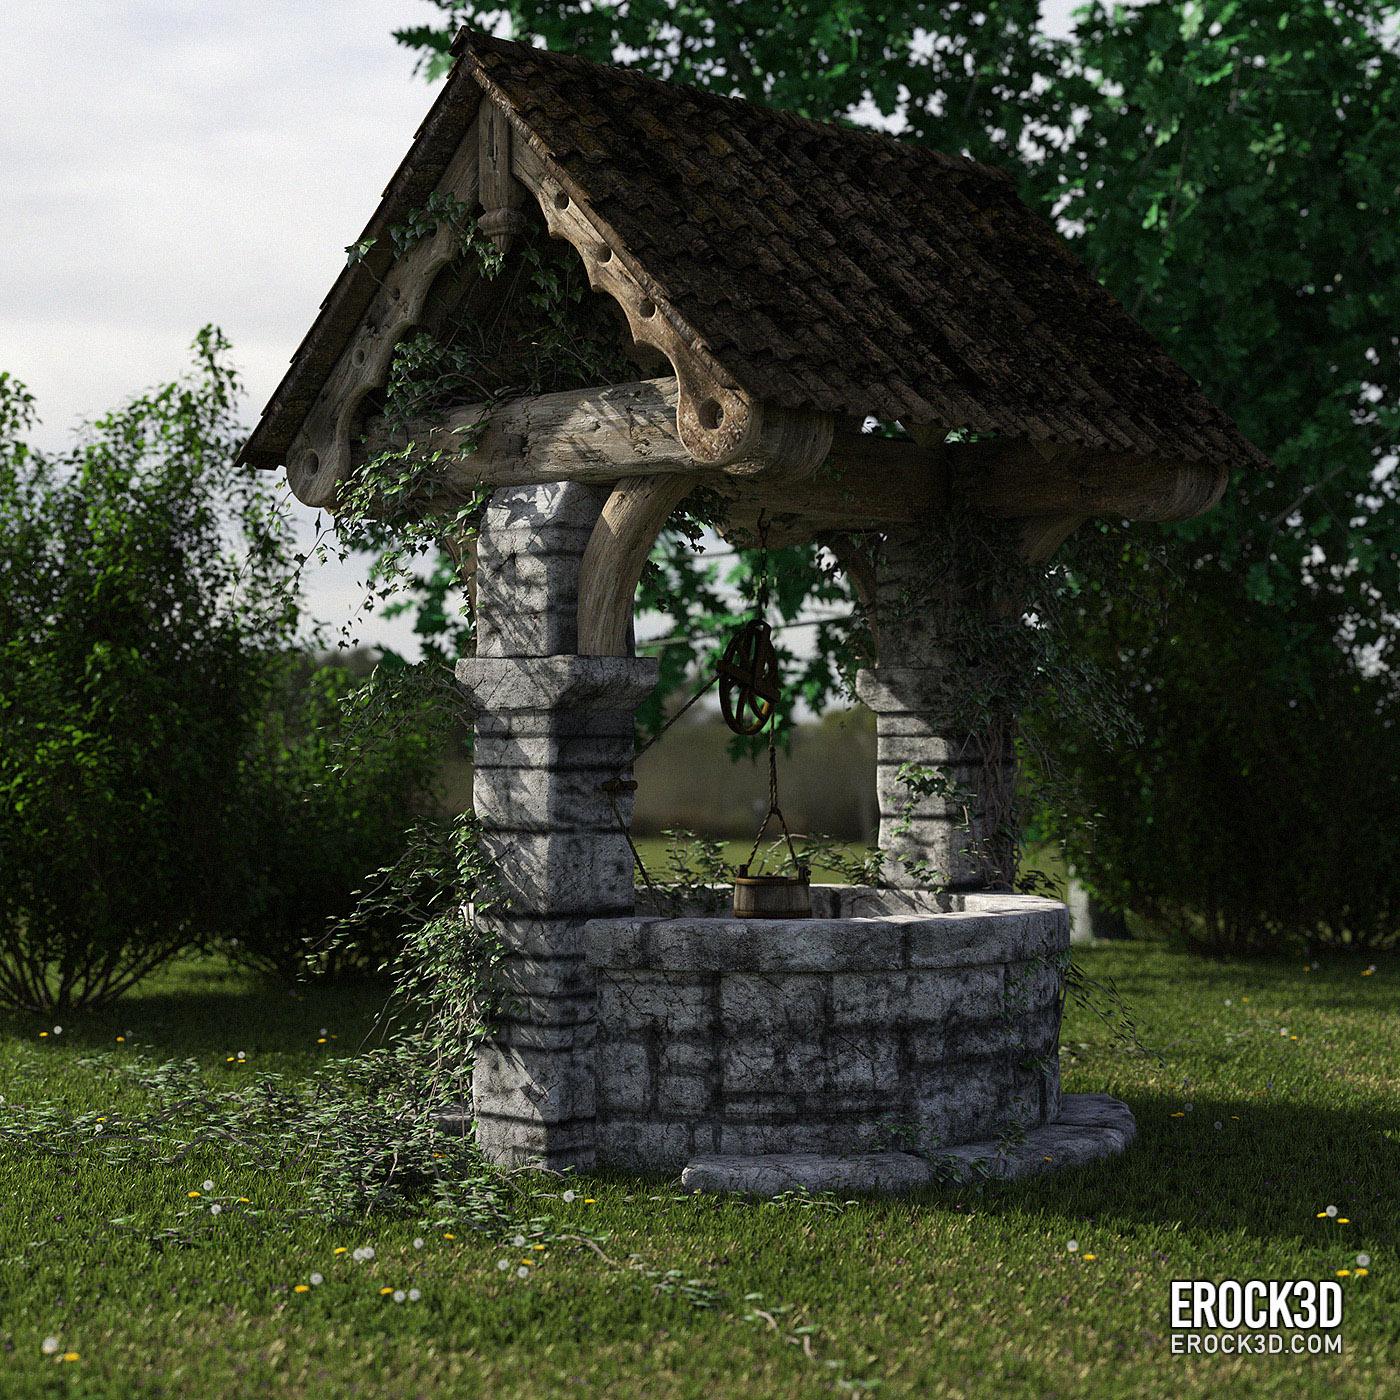 Erock3D Free Grass System Promo - Well